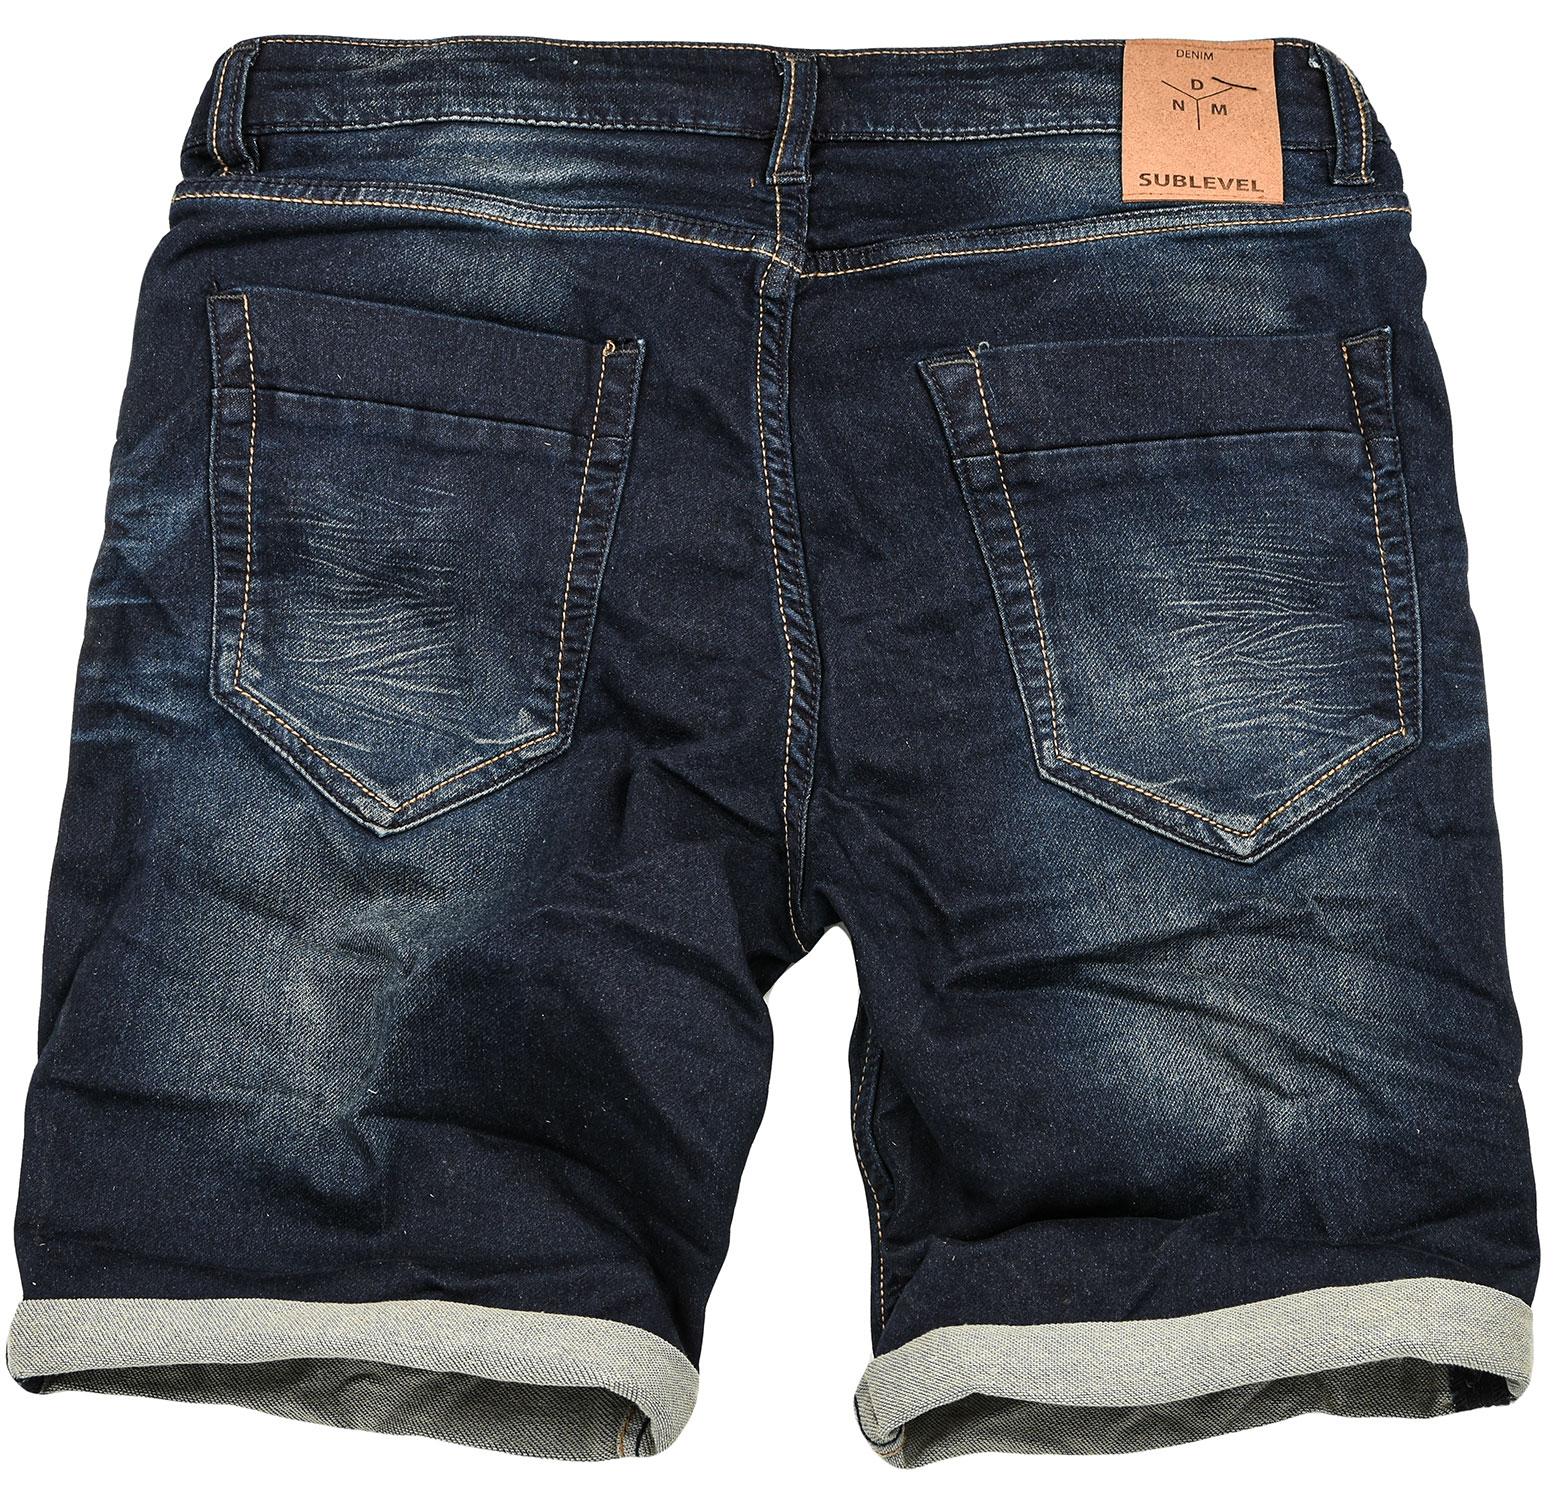 Sublevel-Herren-Sweat-Jeans-Shorts-kurze-Hose-Bermuda-Sommer-Sweathose-Slim-NEU Indexbild 37